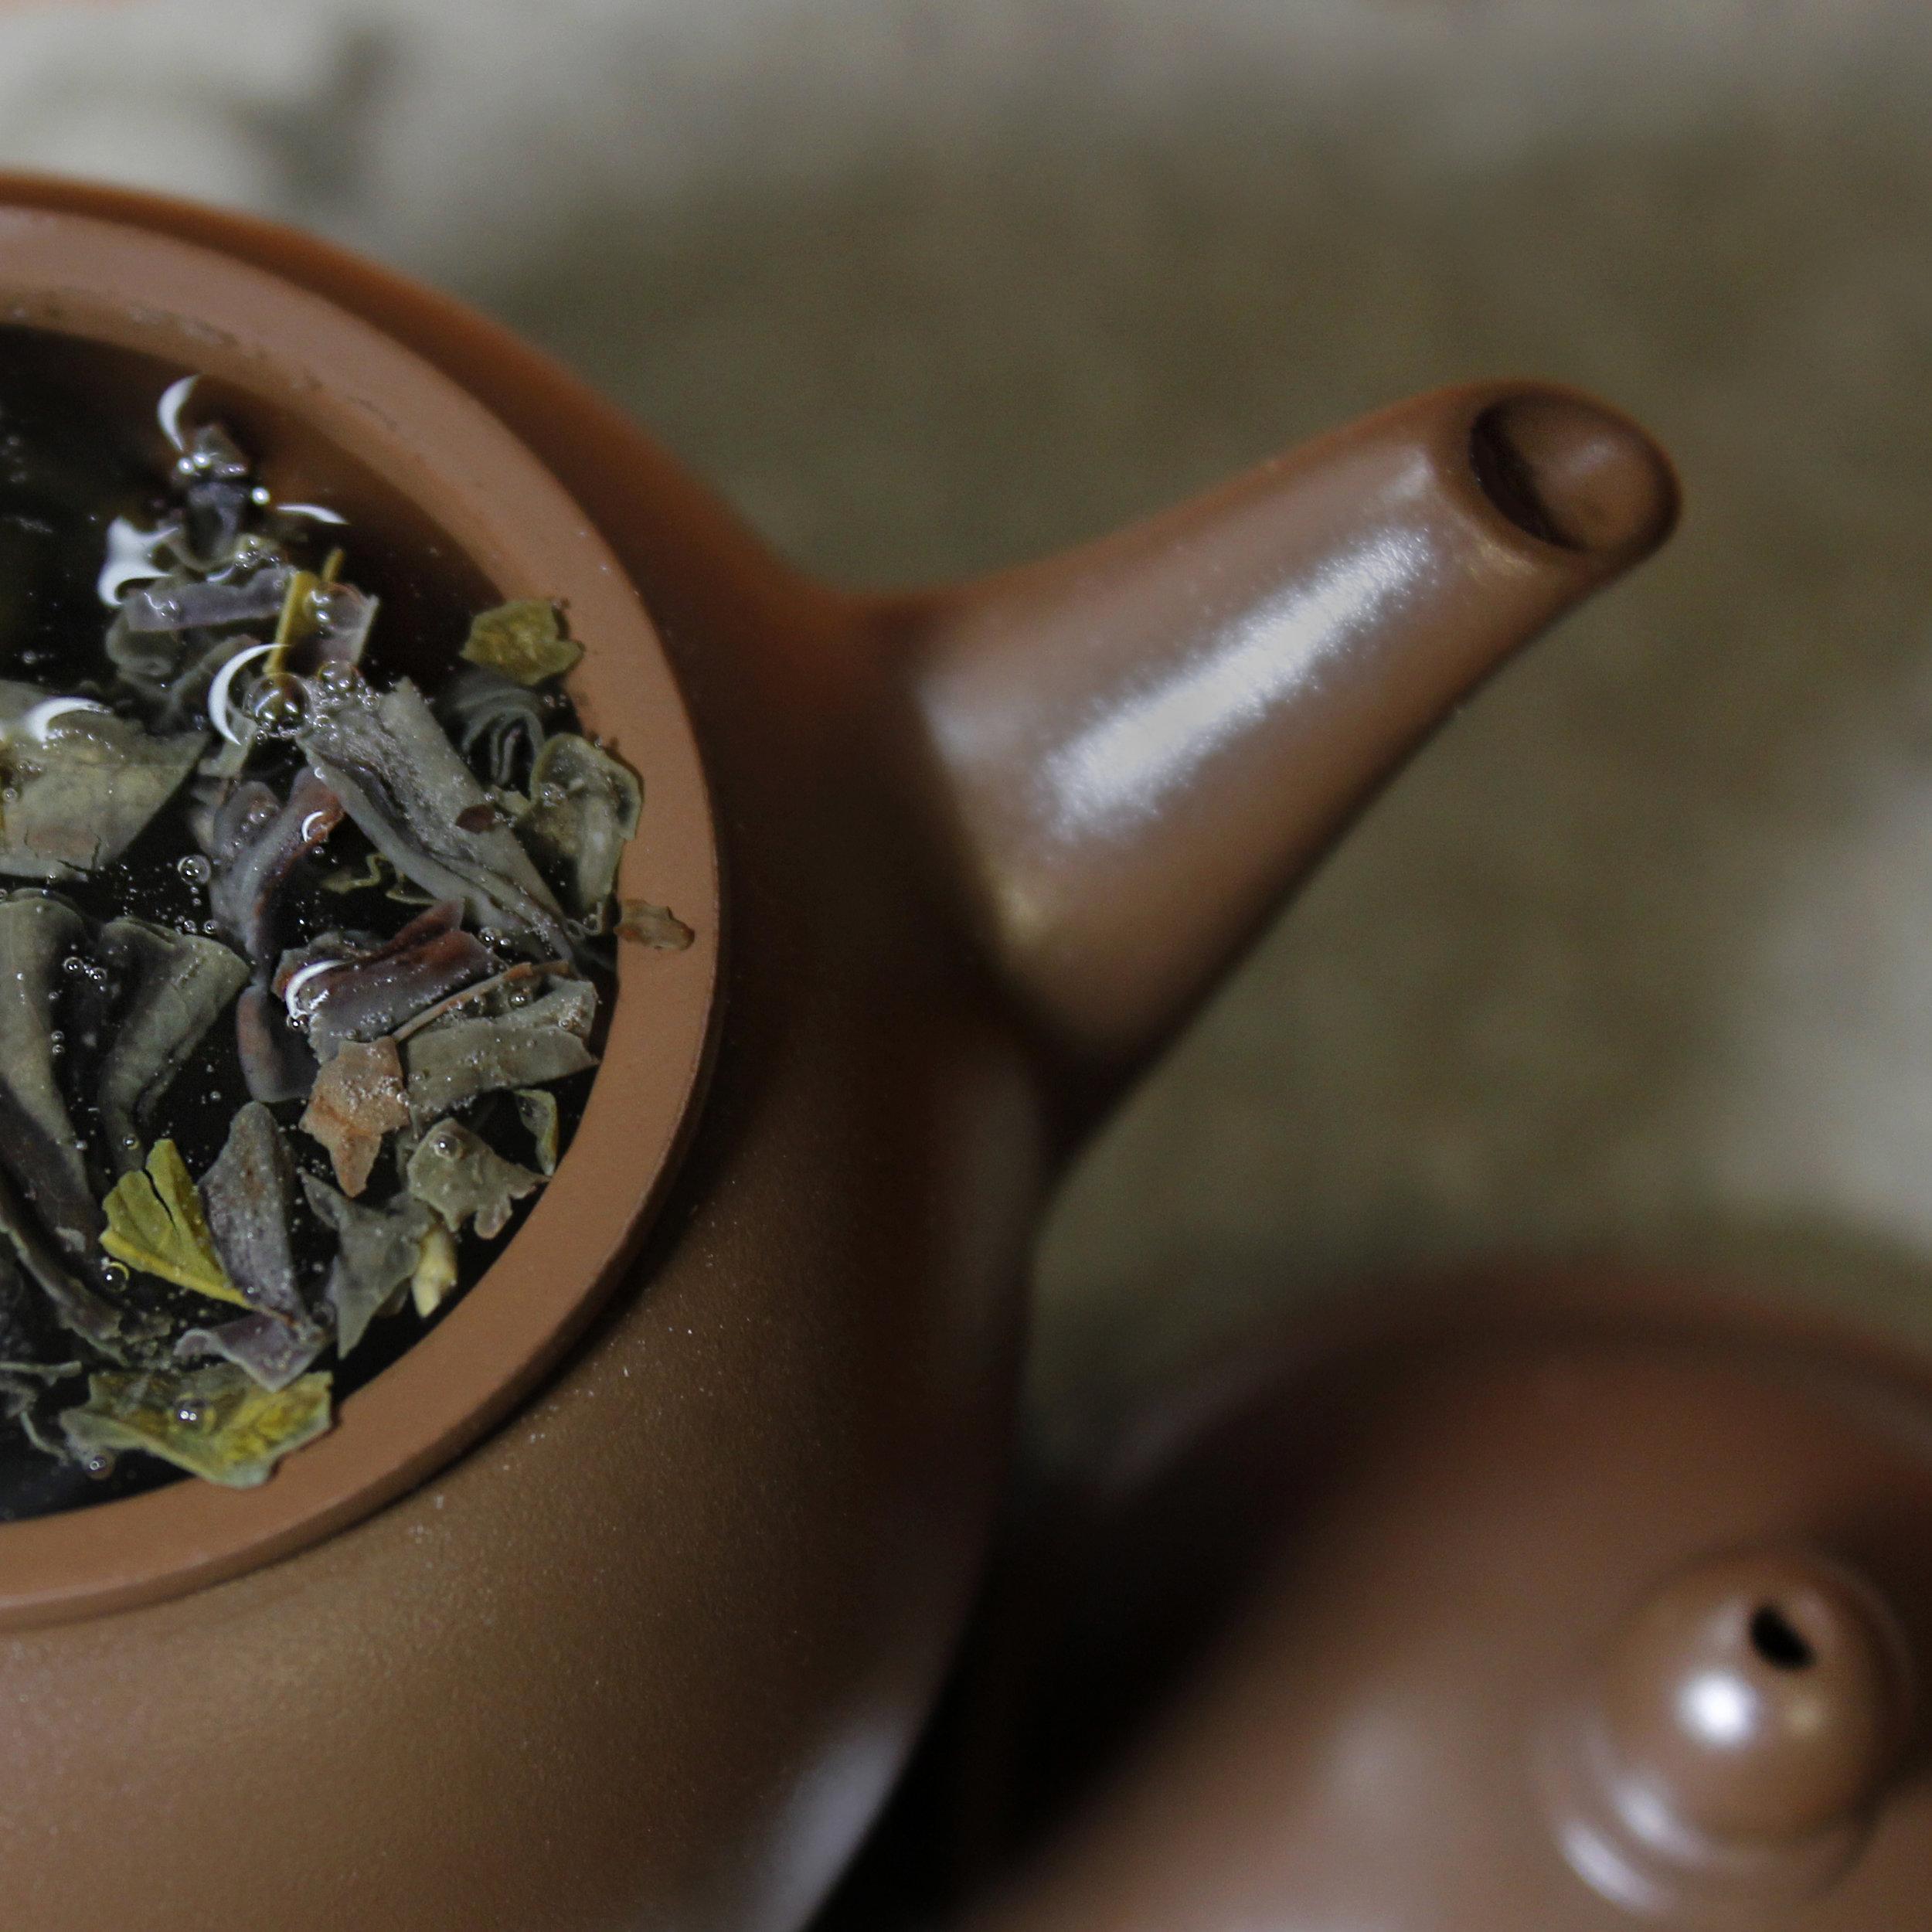 kenya-purple-jasmine-green-tea-blend-africa-itw1-2019a.jpg